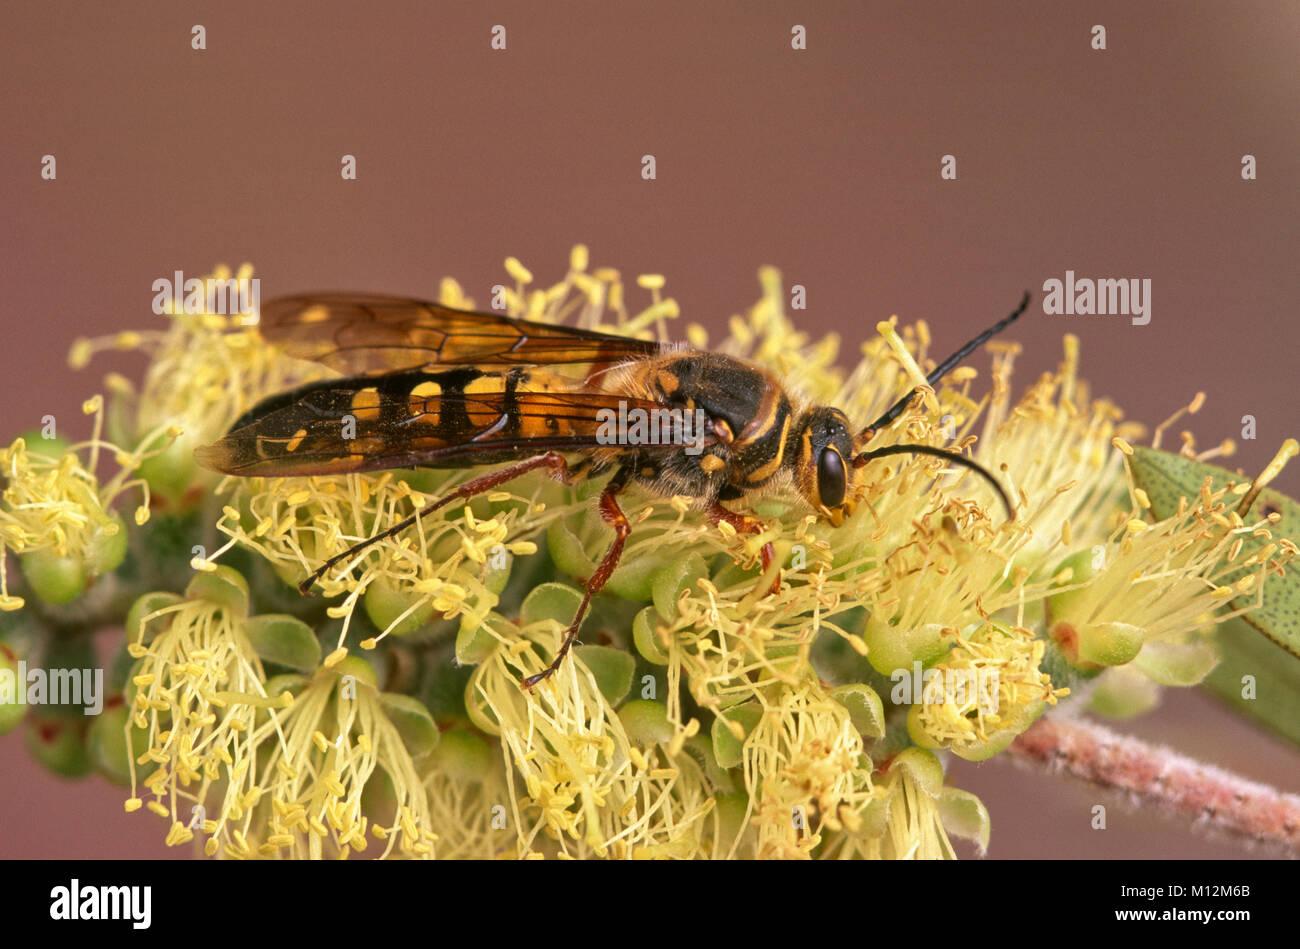 Male flower wasp (Tiphiidae) on bottlebrush flower - Stock Image